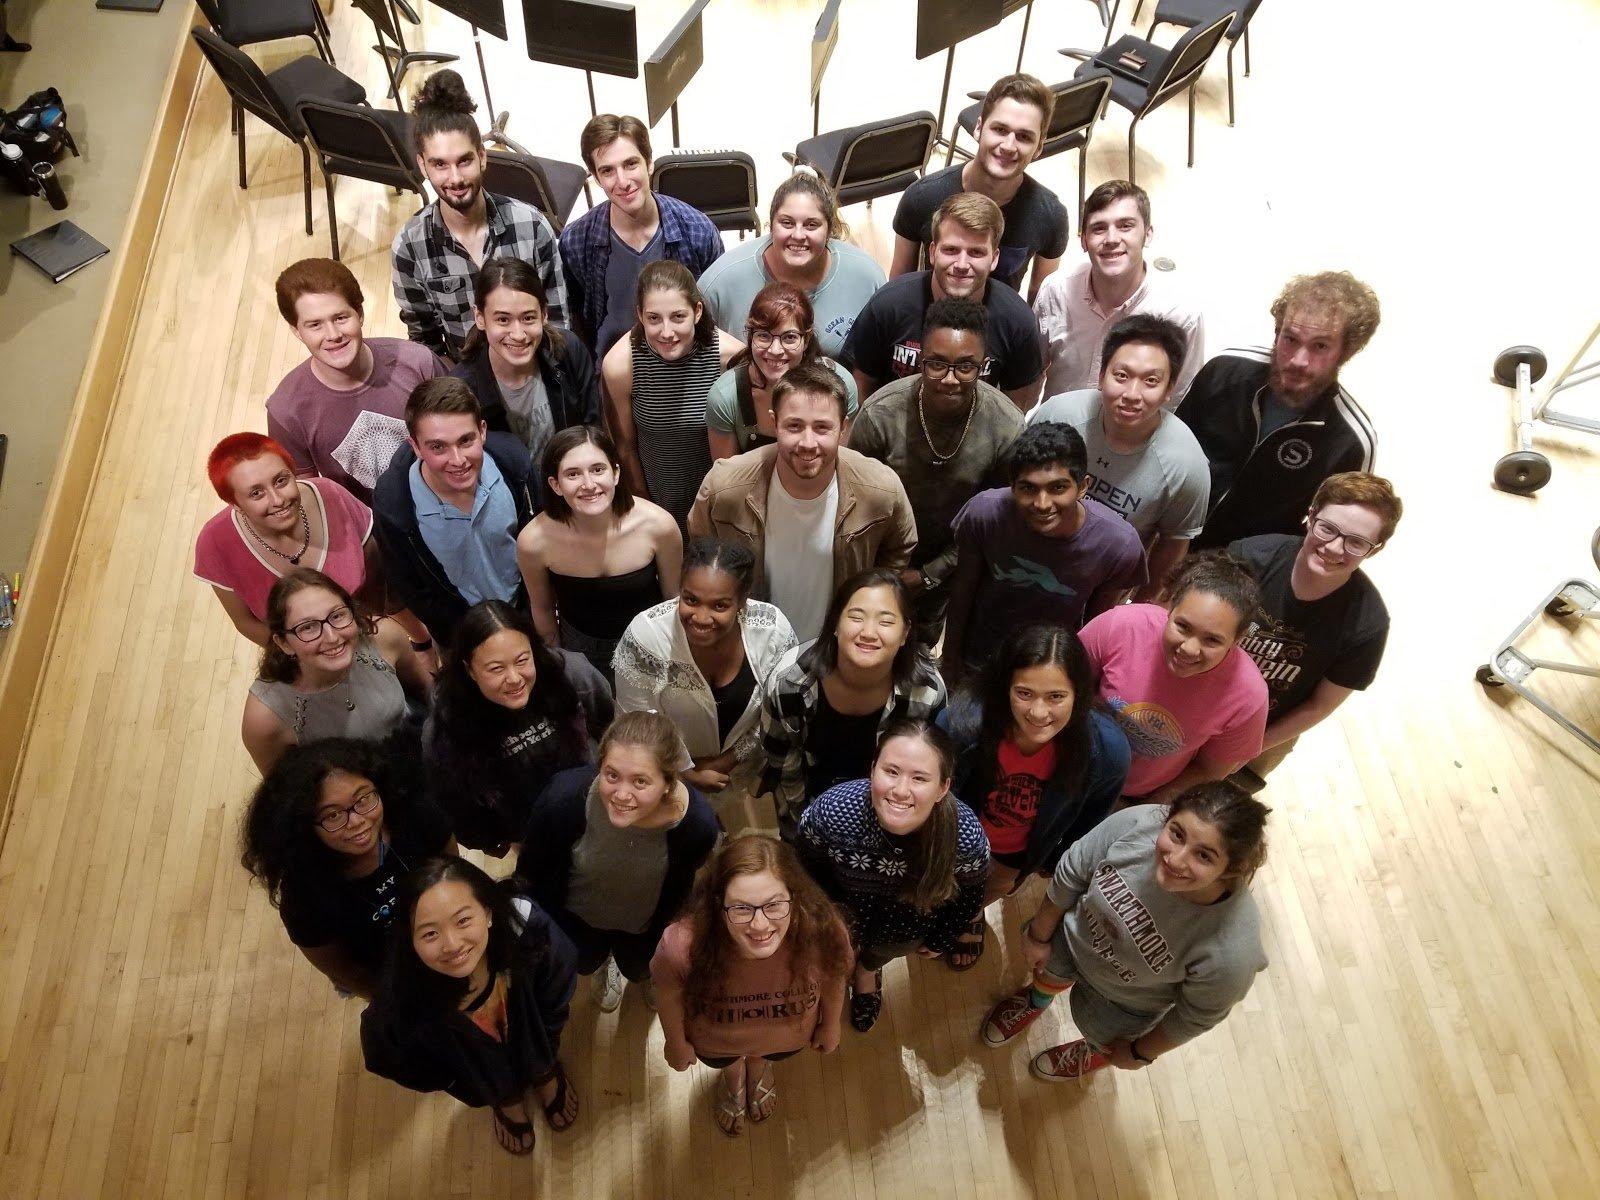 Swarthmore music students huddled together